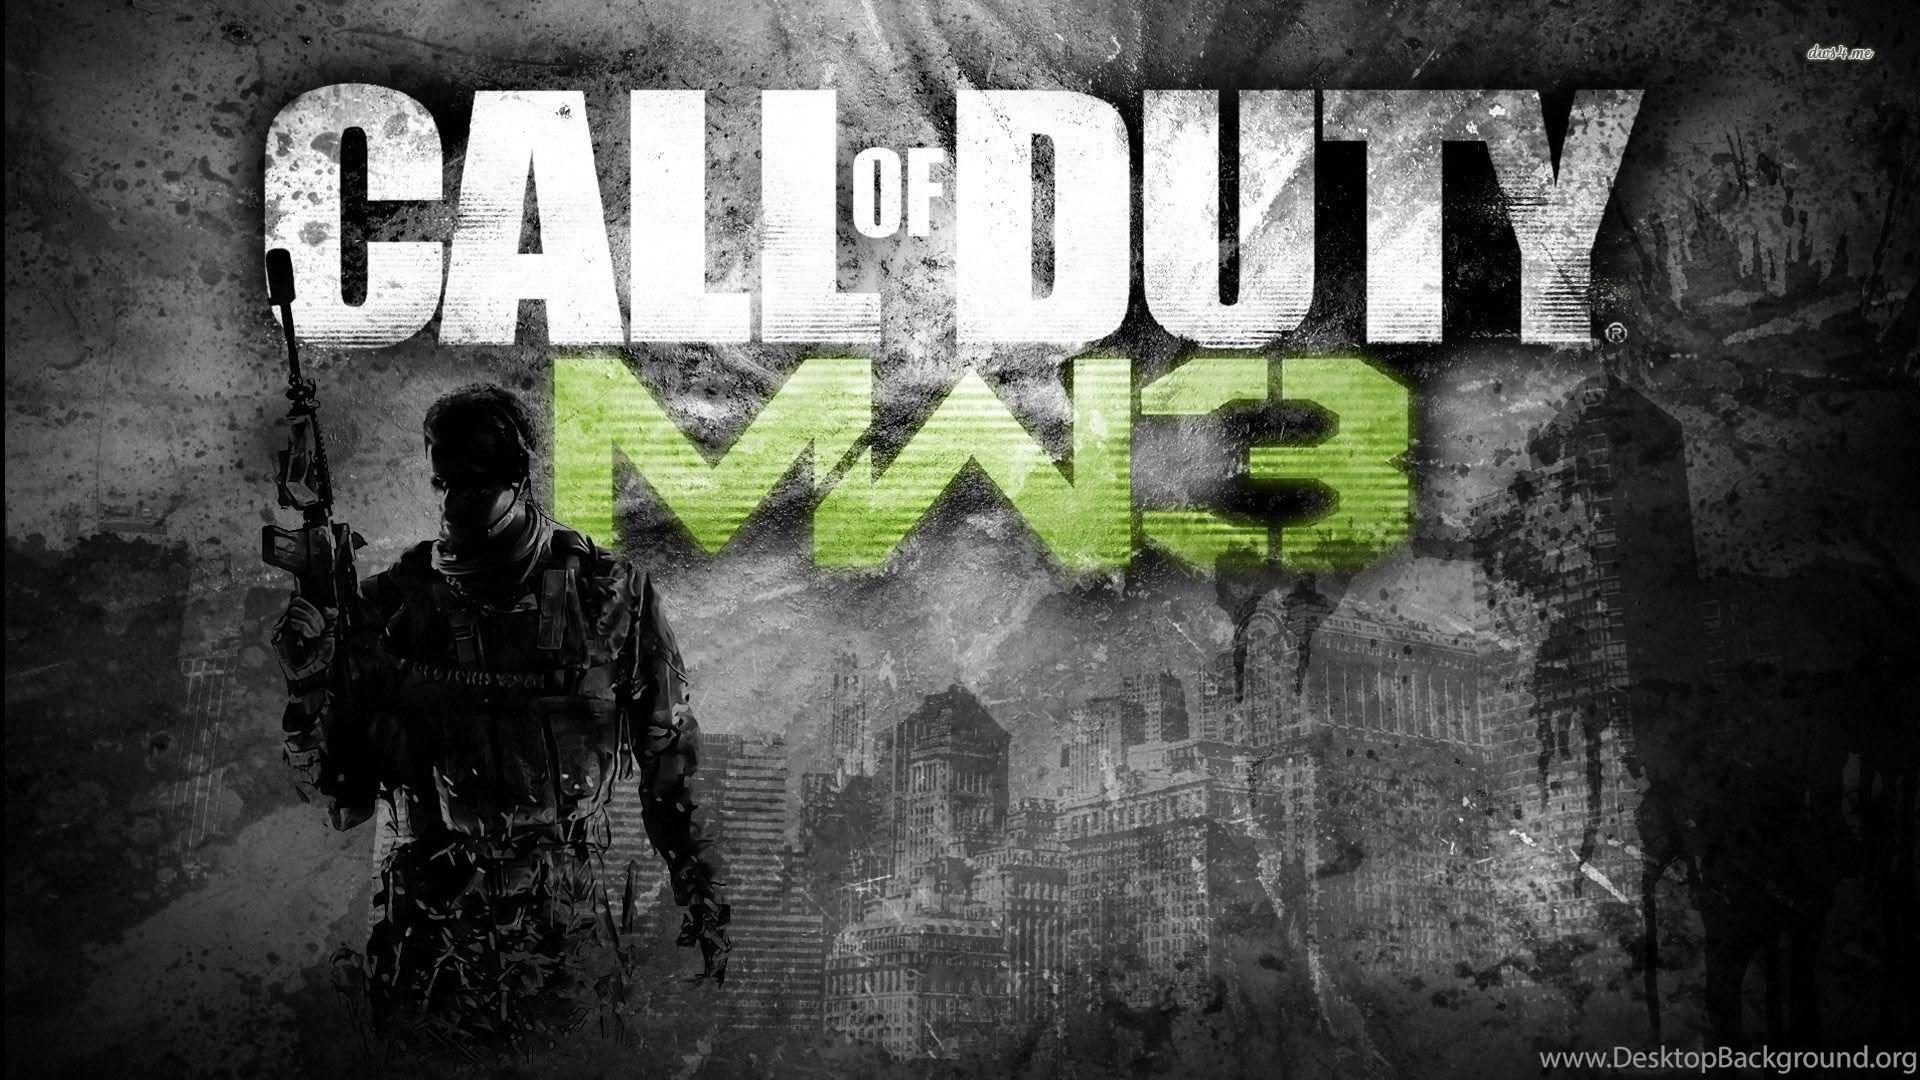 Call Of Duty Modern Warfare 3 Wallpapers Game Wallpapers Desktop